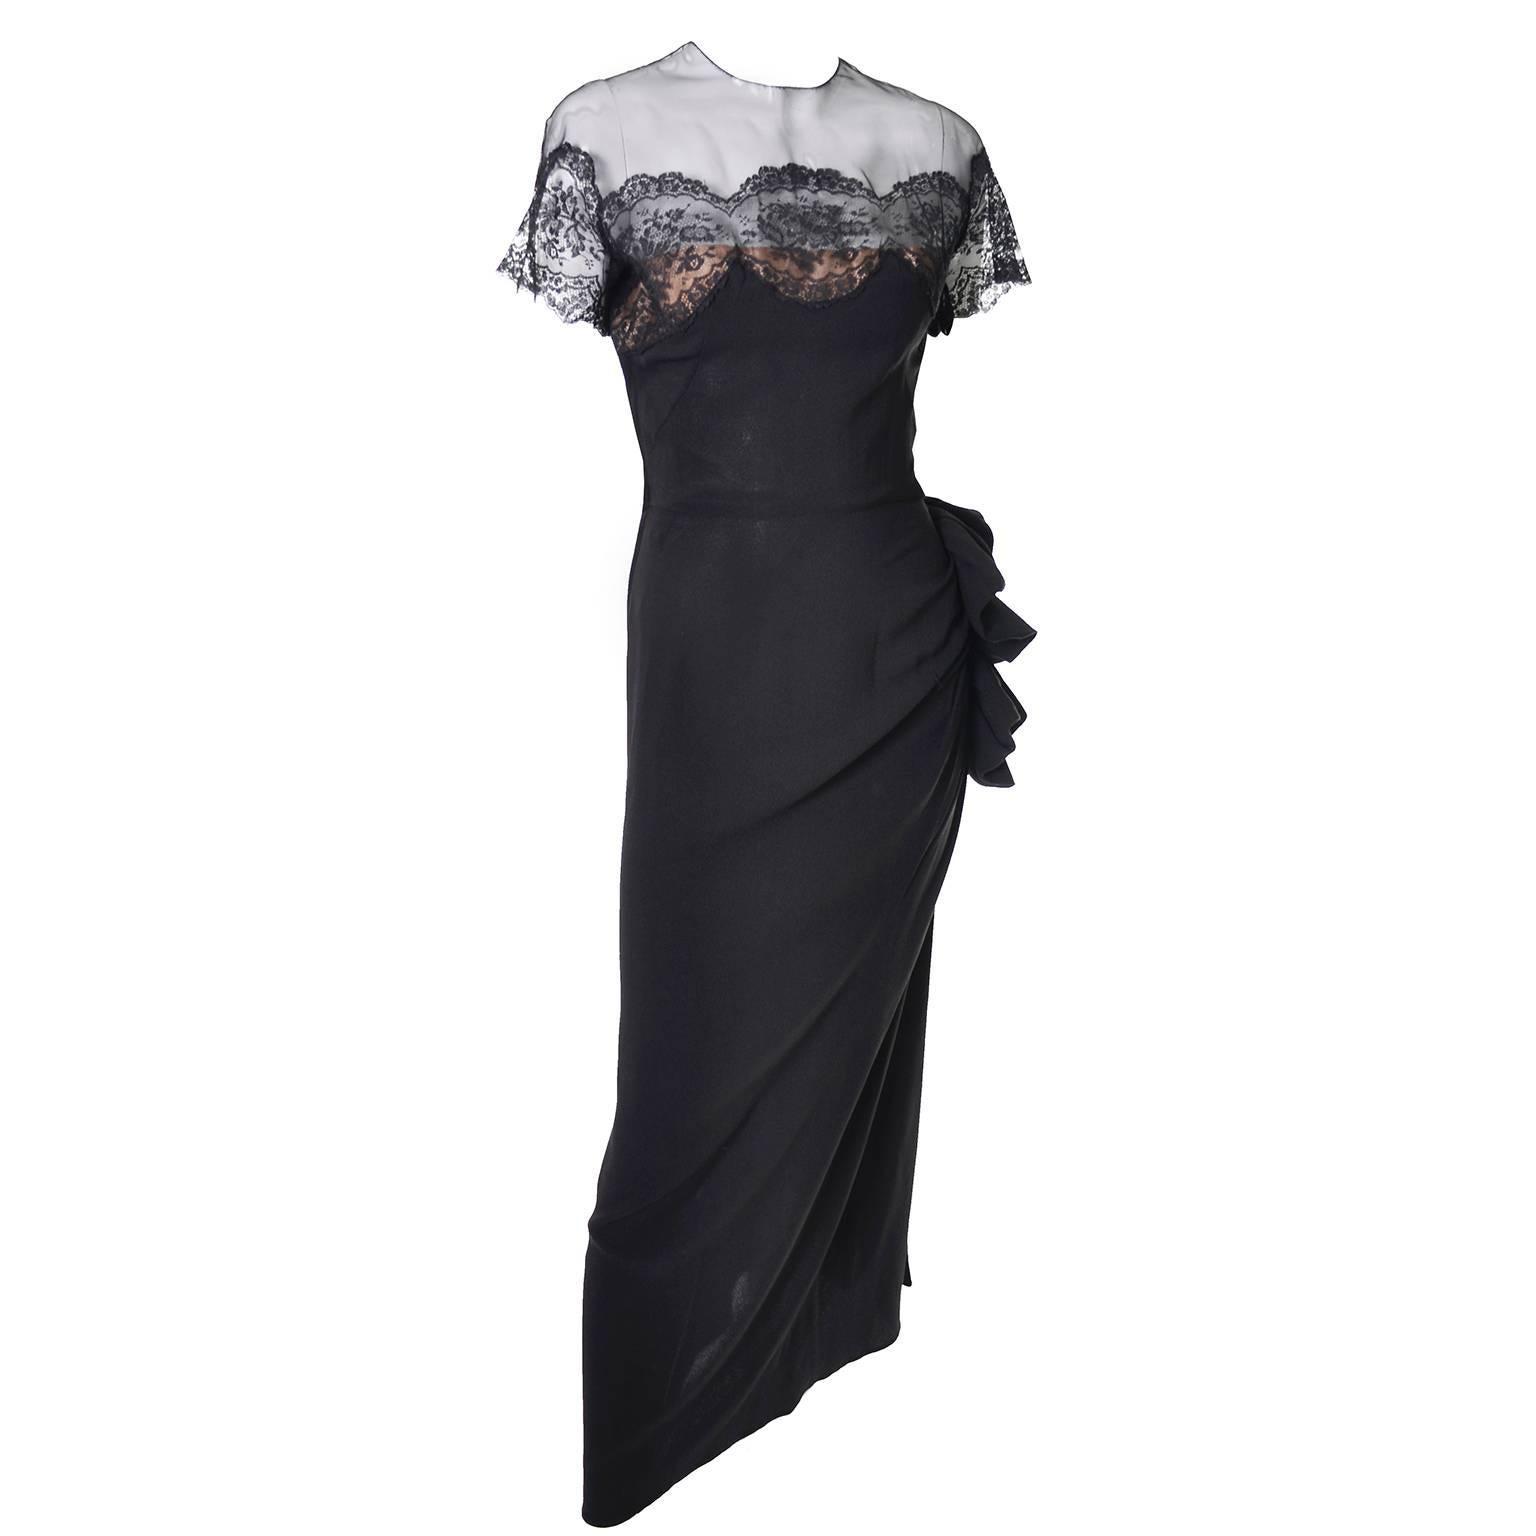 Peggy Hunt Vintage Dress Black Crepe Lace Evening Gown Illusion Bodice 1940s